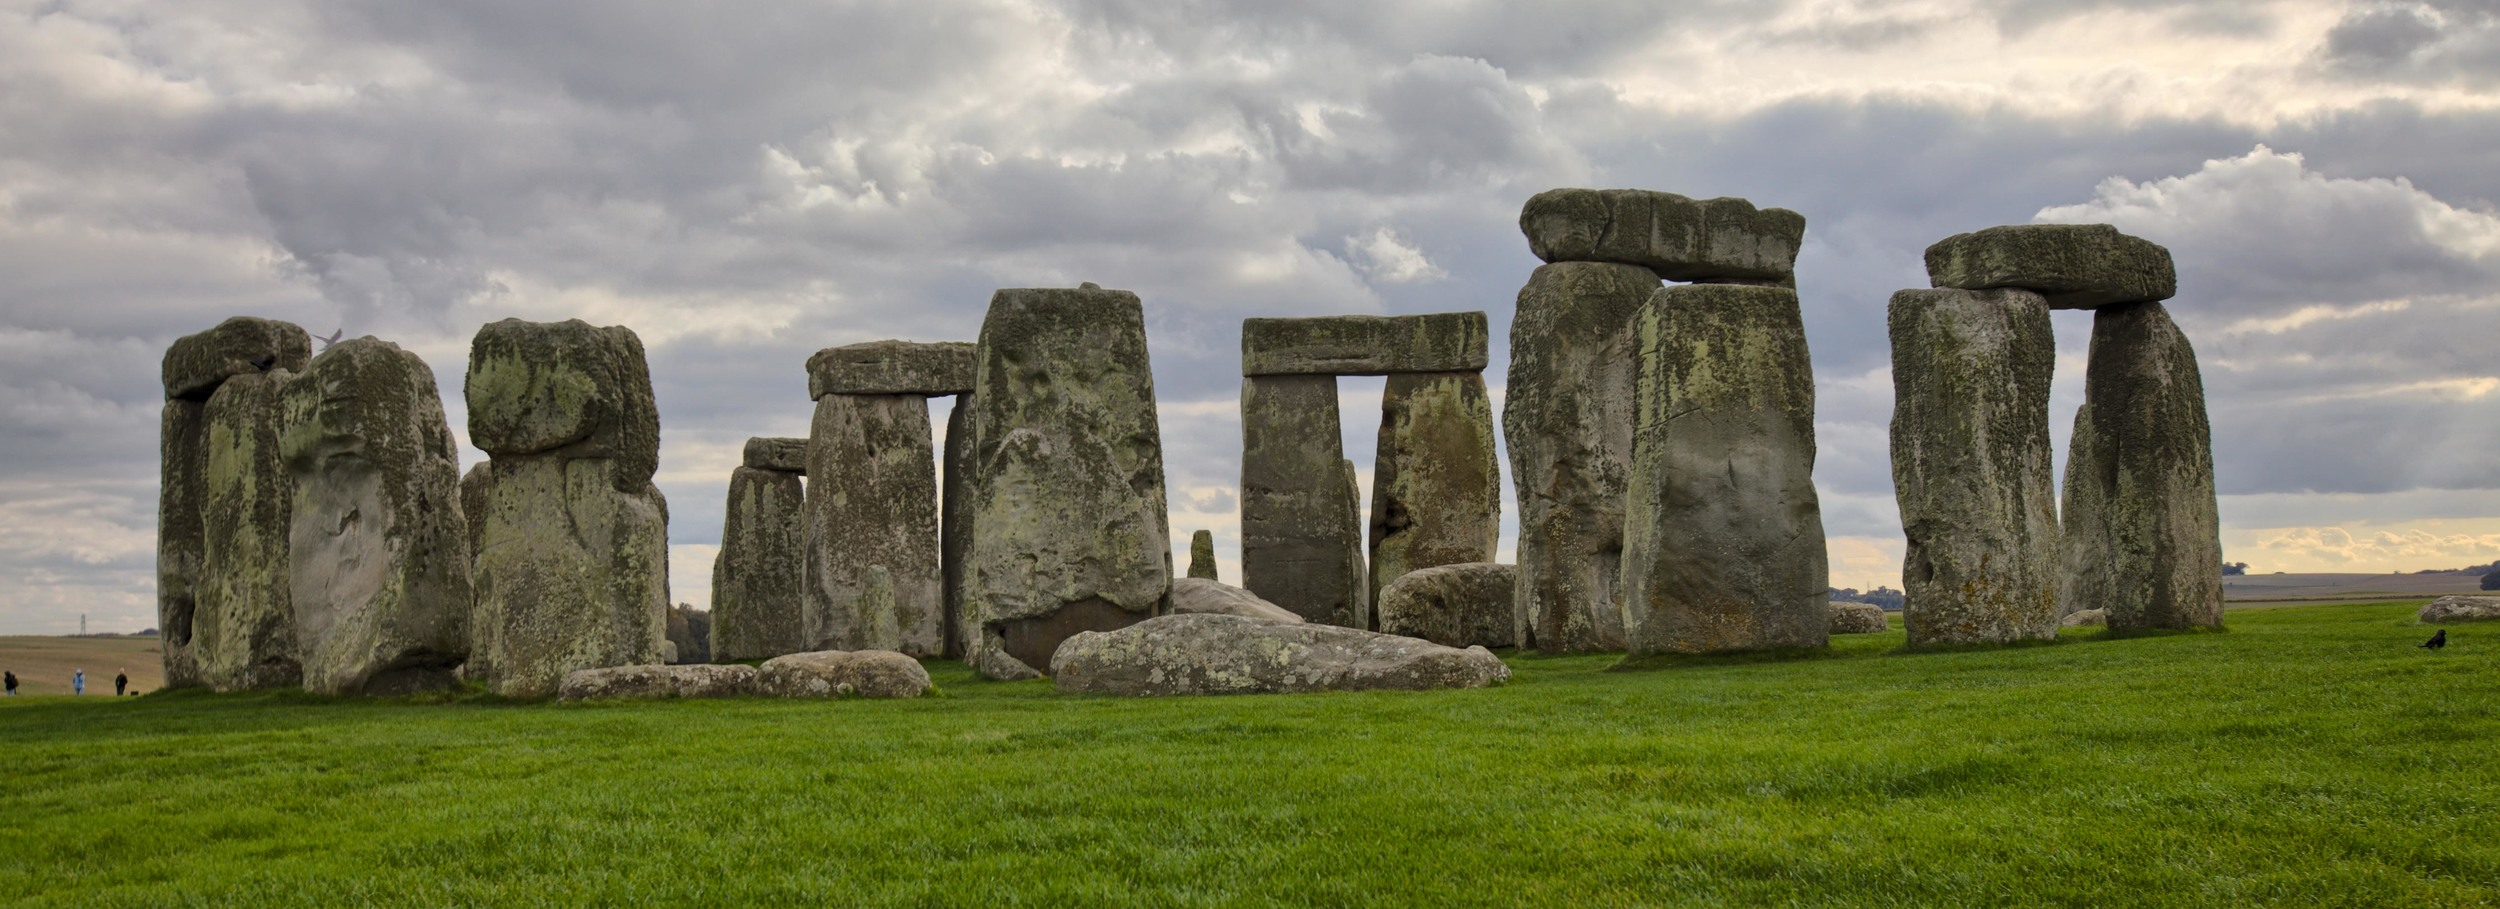 Stonehenge-HDR-1.jpg